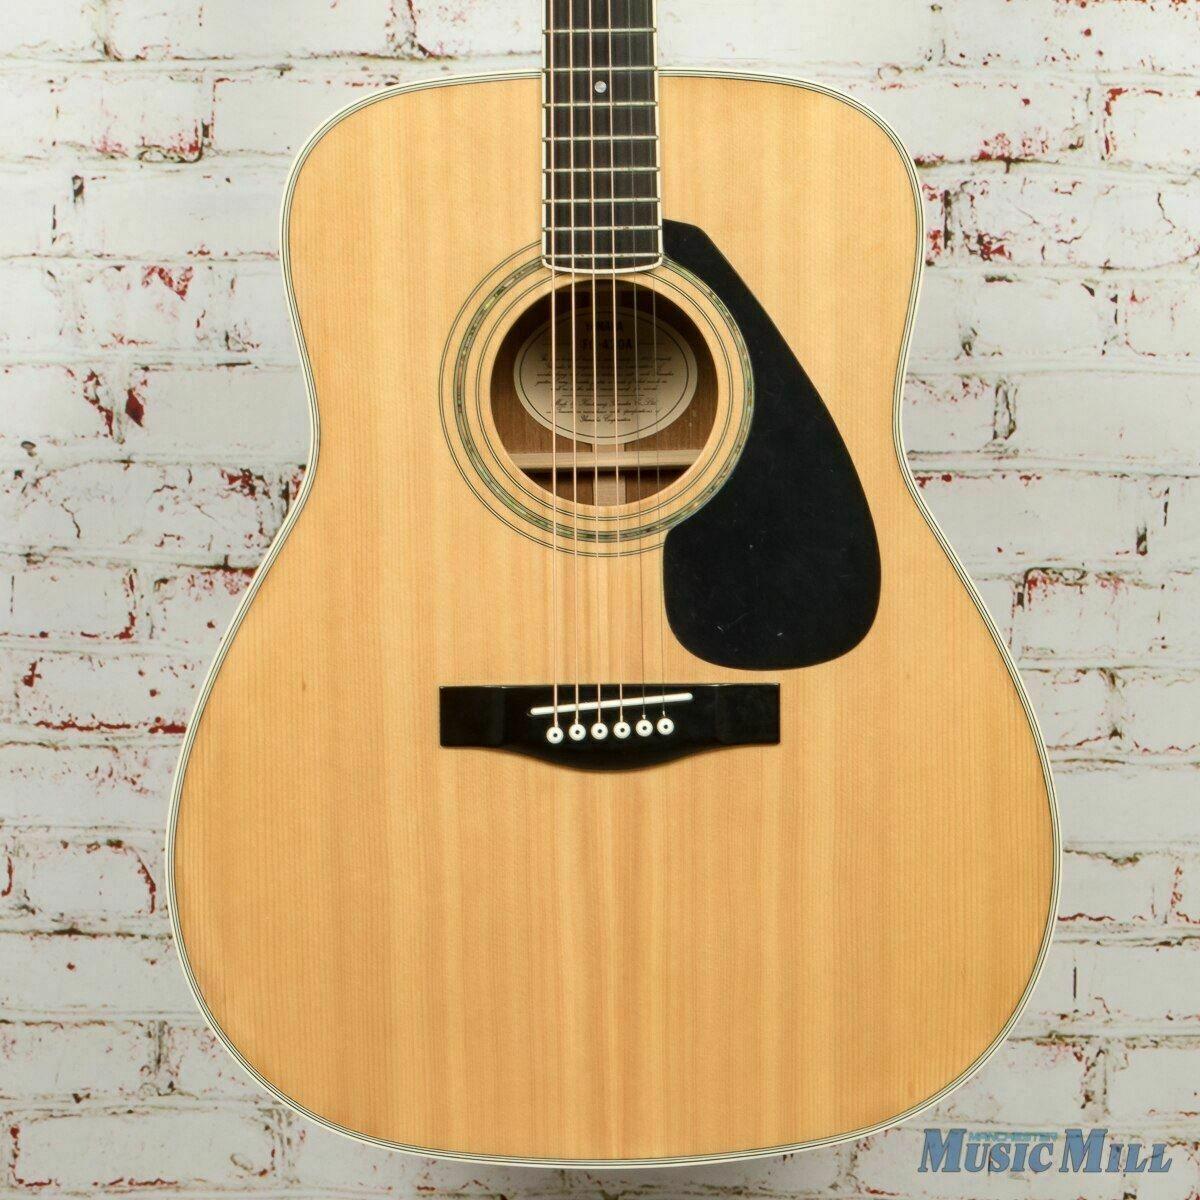 Yamaha Ntx1200r Cutaway Acoustic Electric Guitar Used Acoustic Electric Guitar Acoustic Electric Yamaha Acoustic Guitar